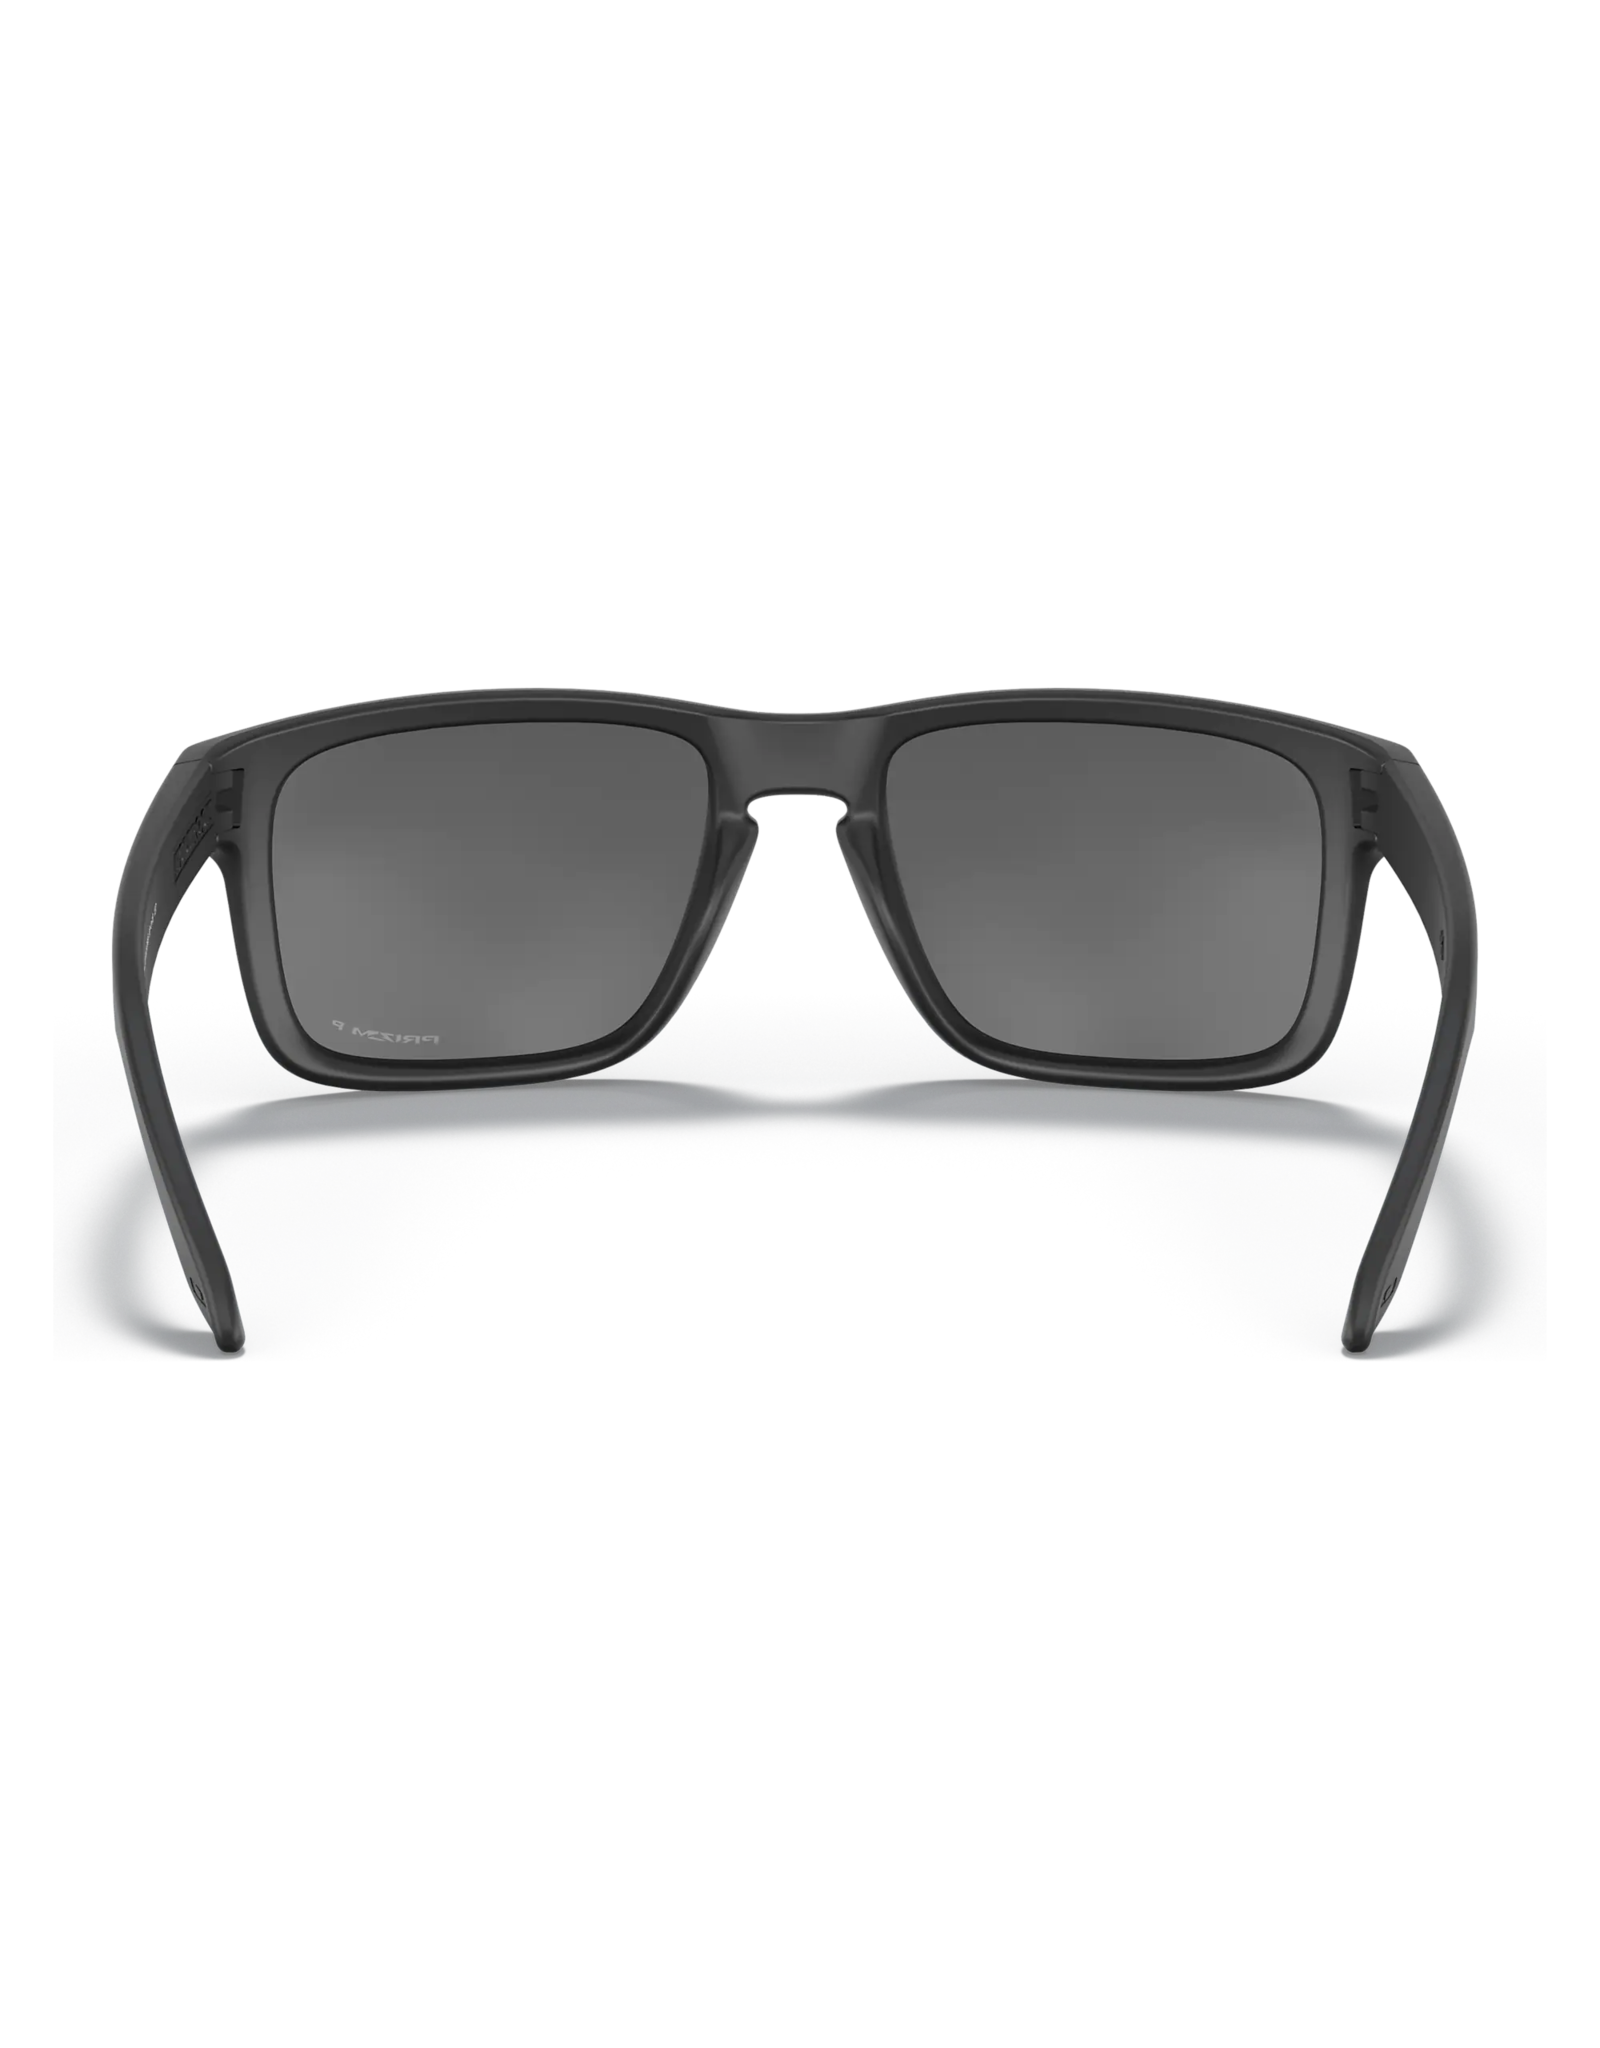 OAKLEY Oakley Holbrook matte black prizm black iridium polarized sun glasses